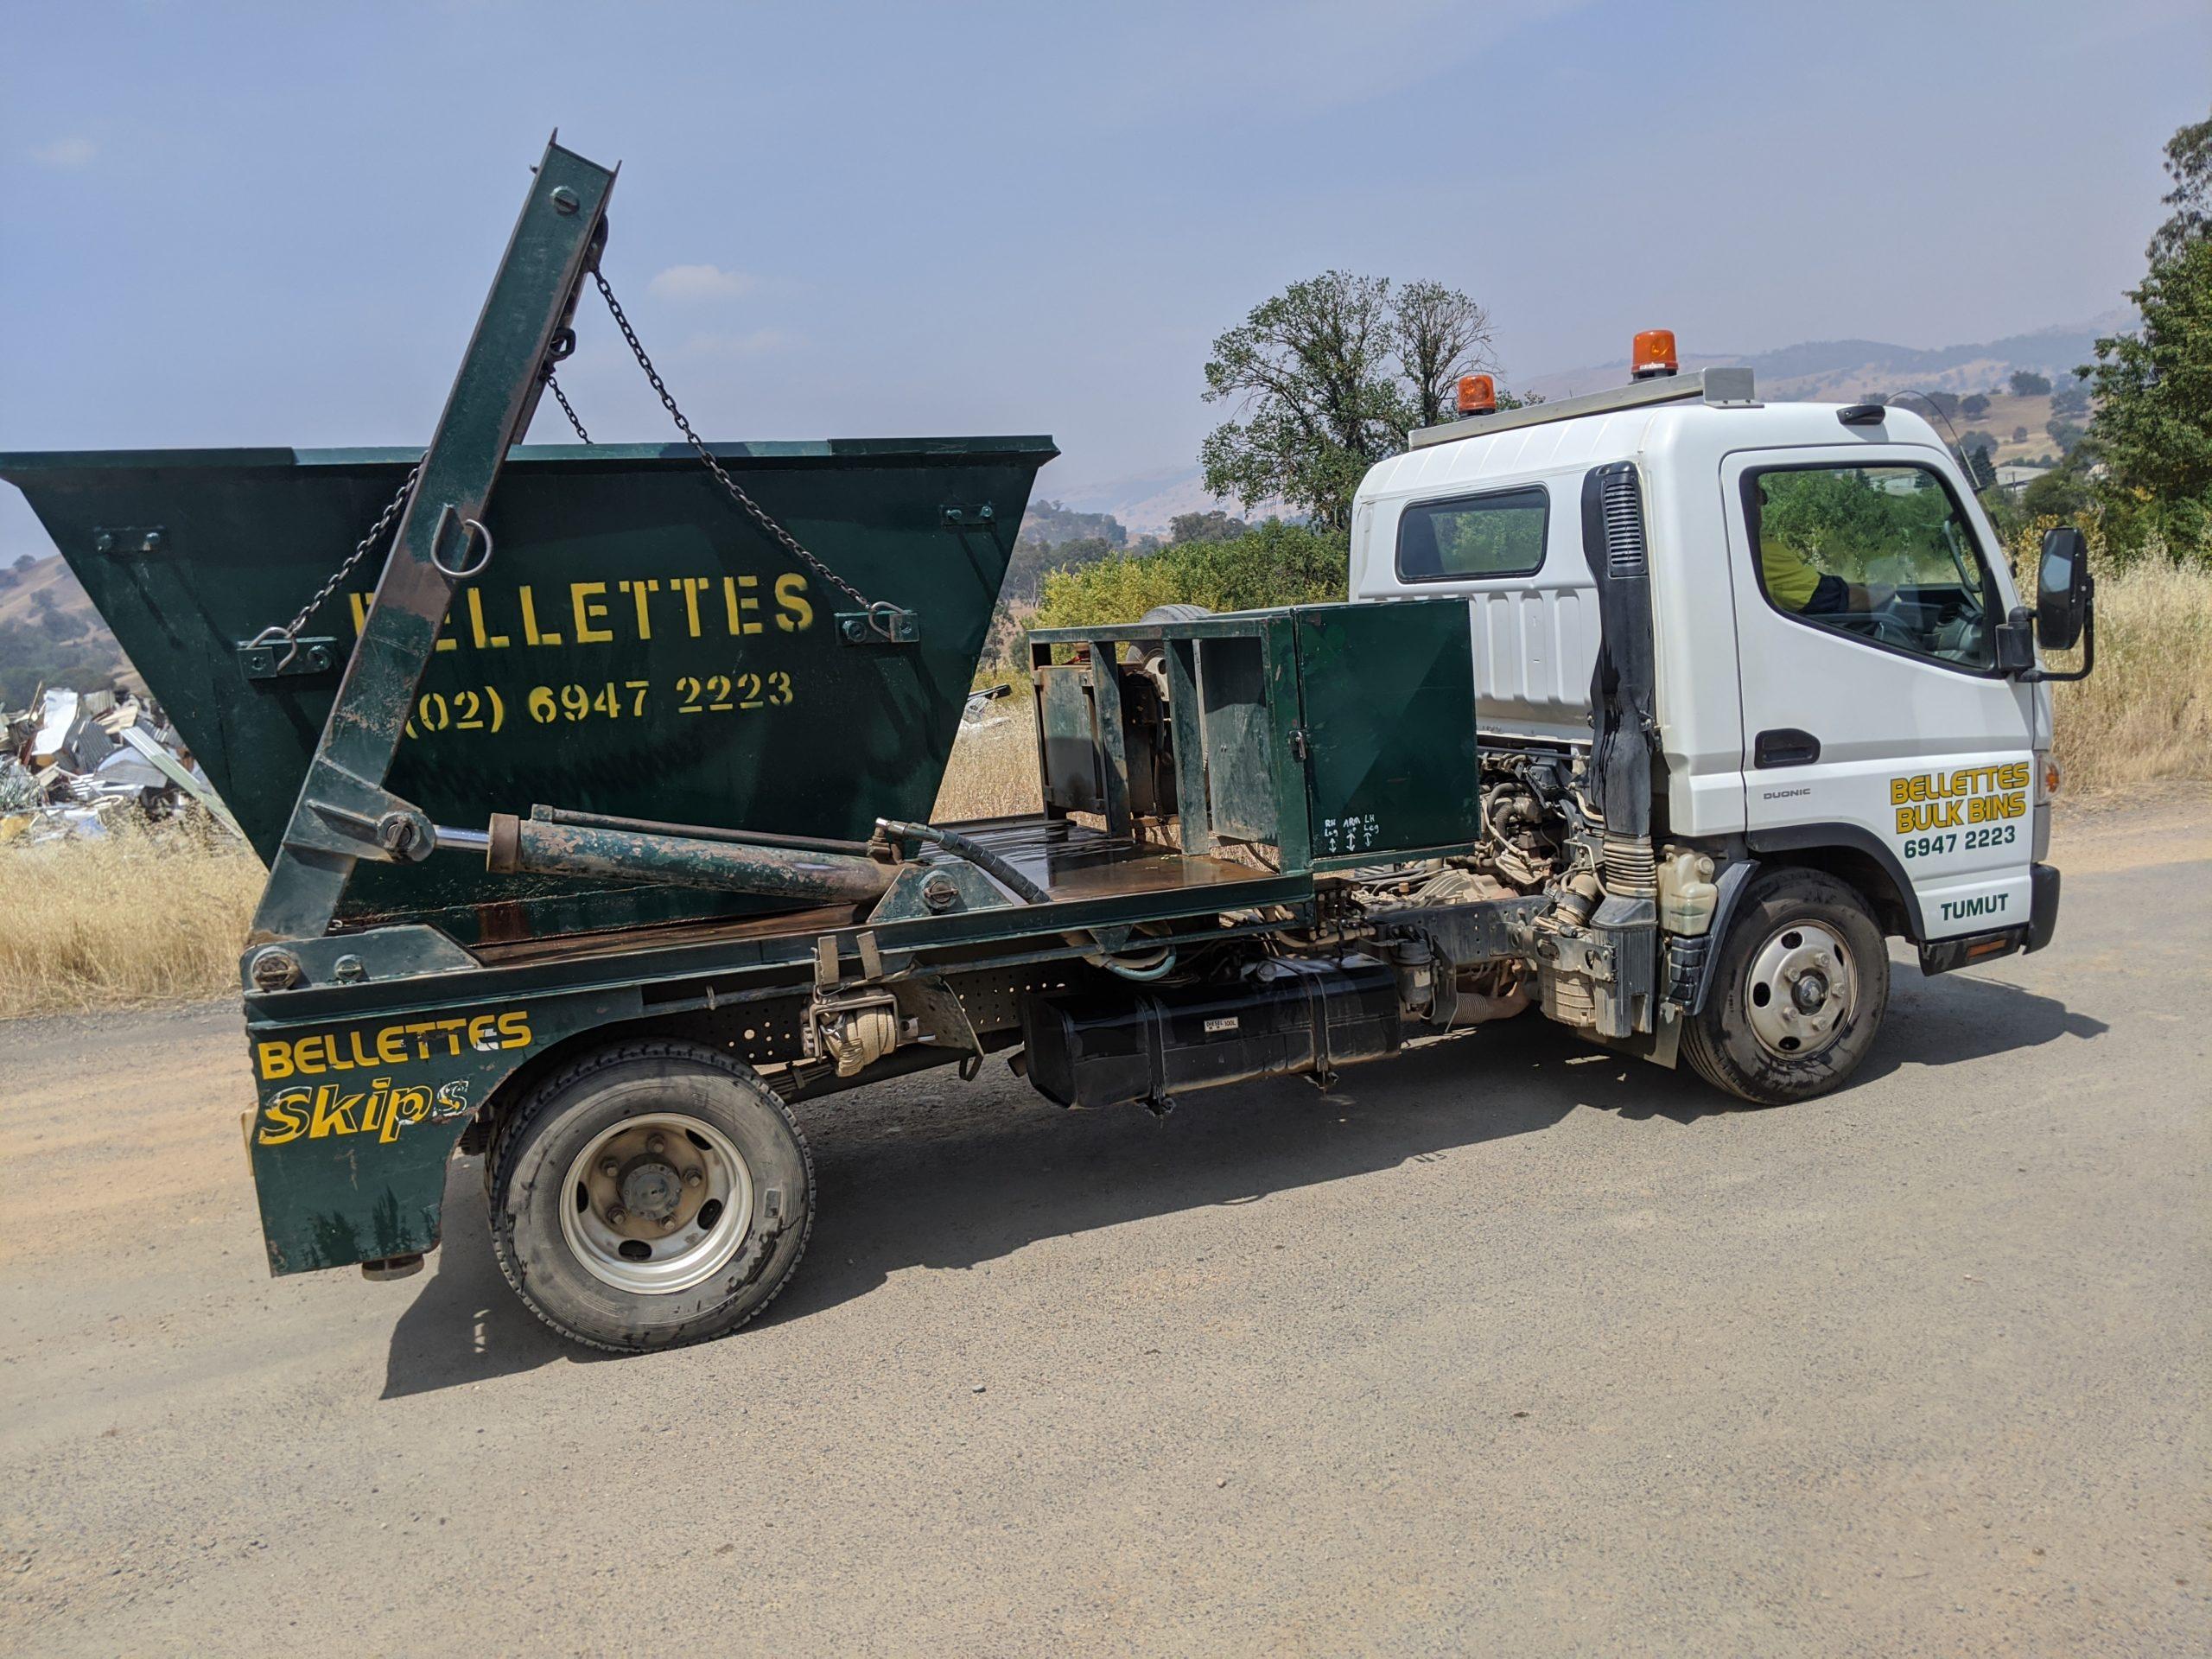 Small truck with skip bin ready for delivery. Bellette's Bulk Bins